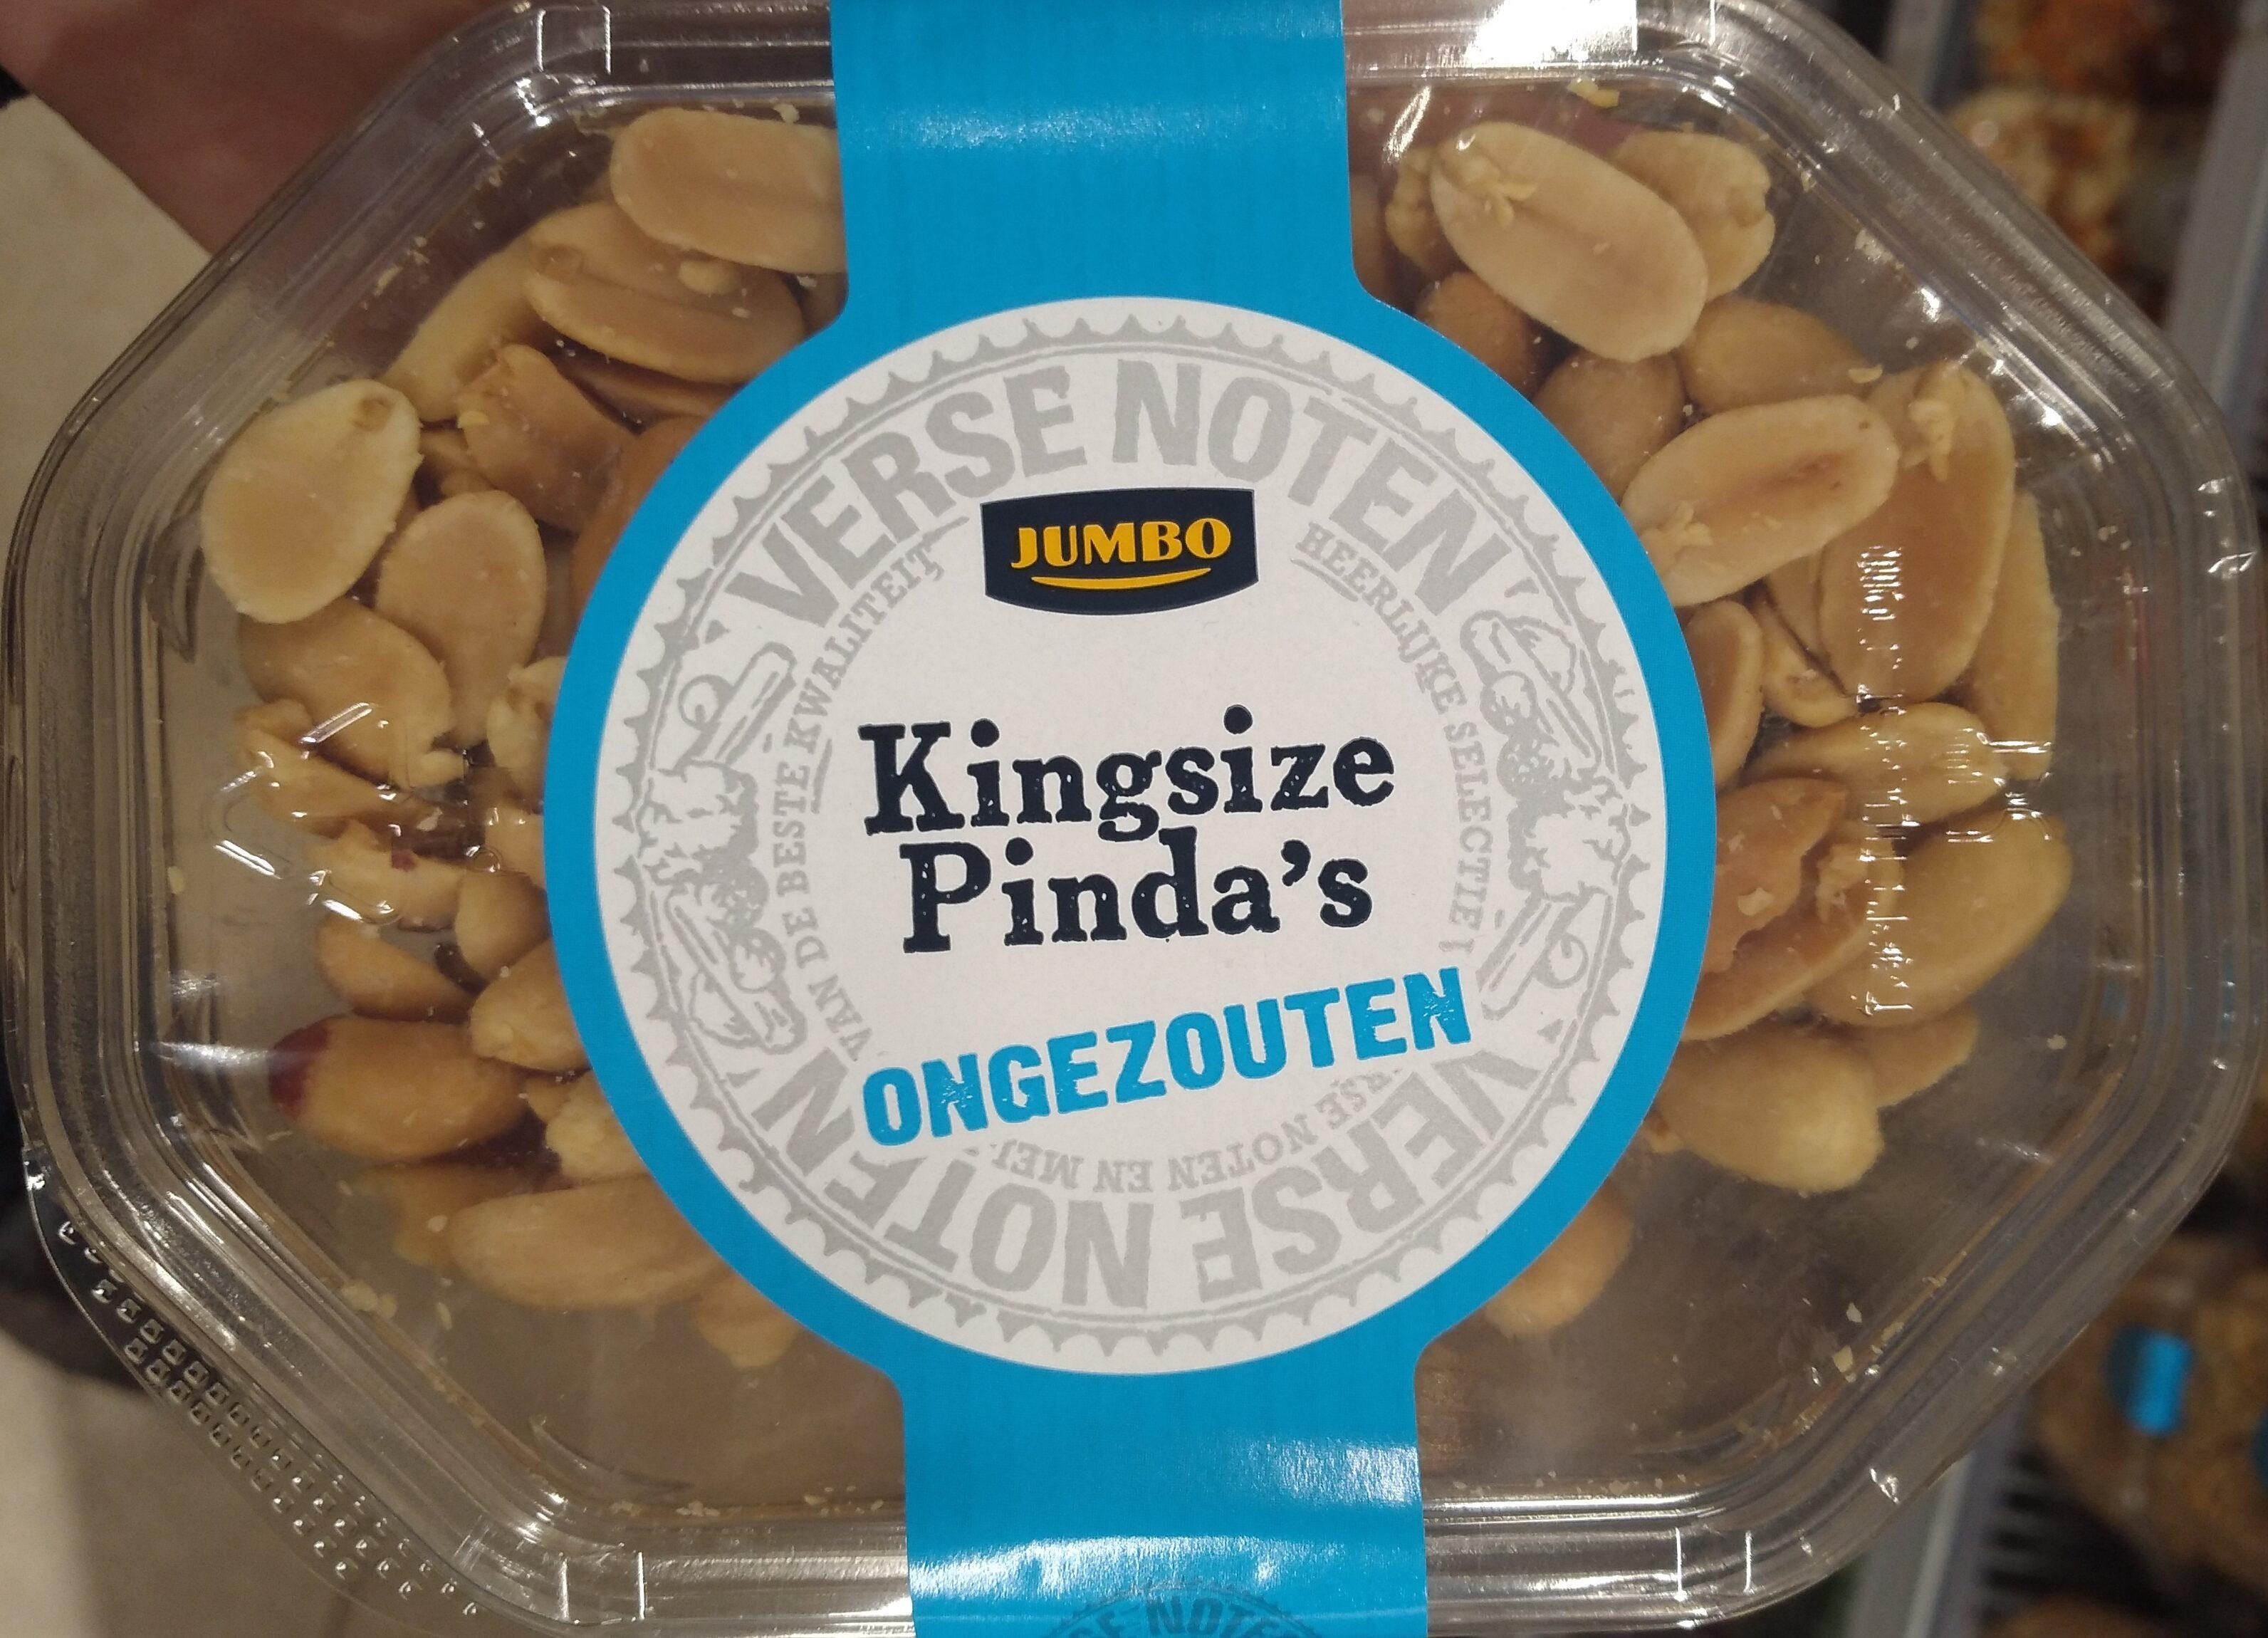 Kingsize pinda's ongezouten - Product - nl